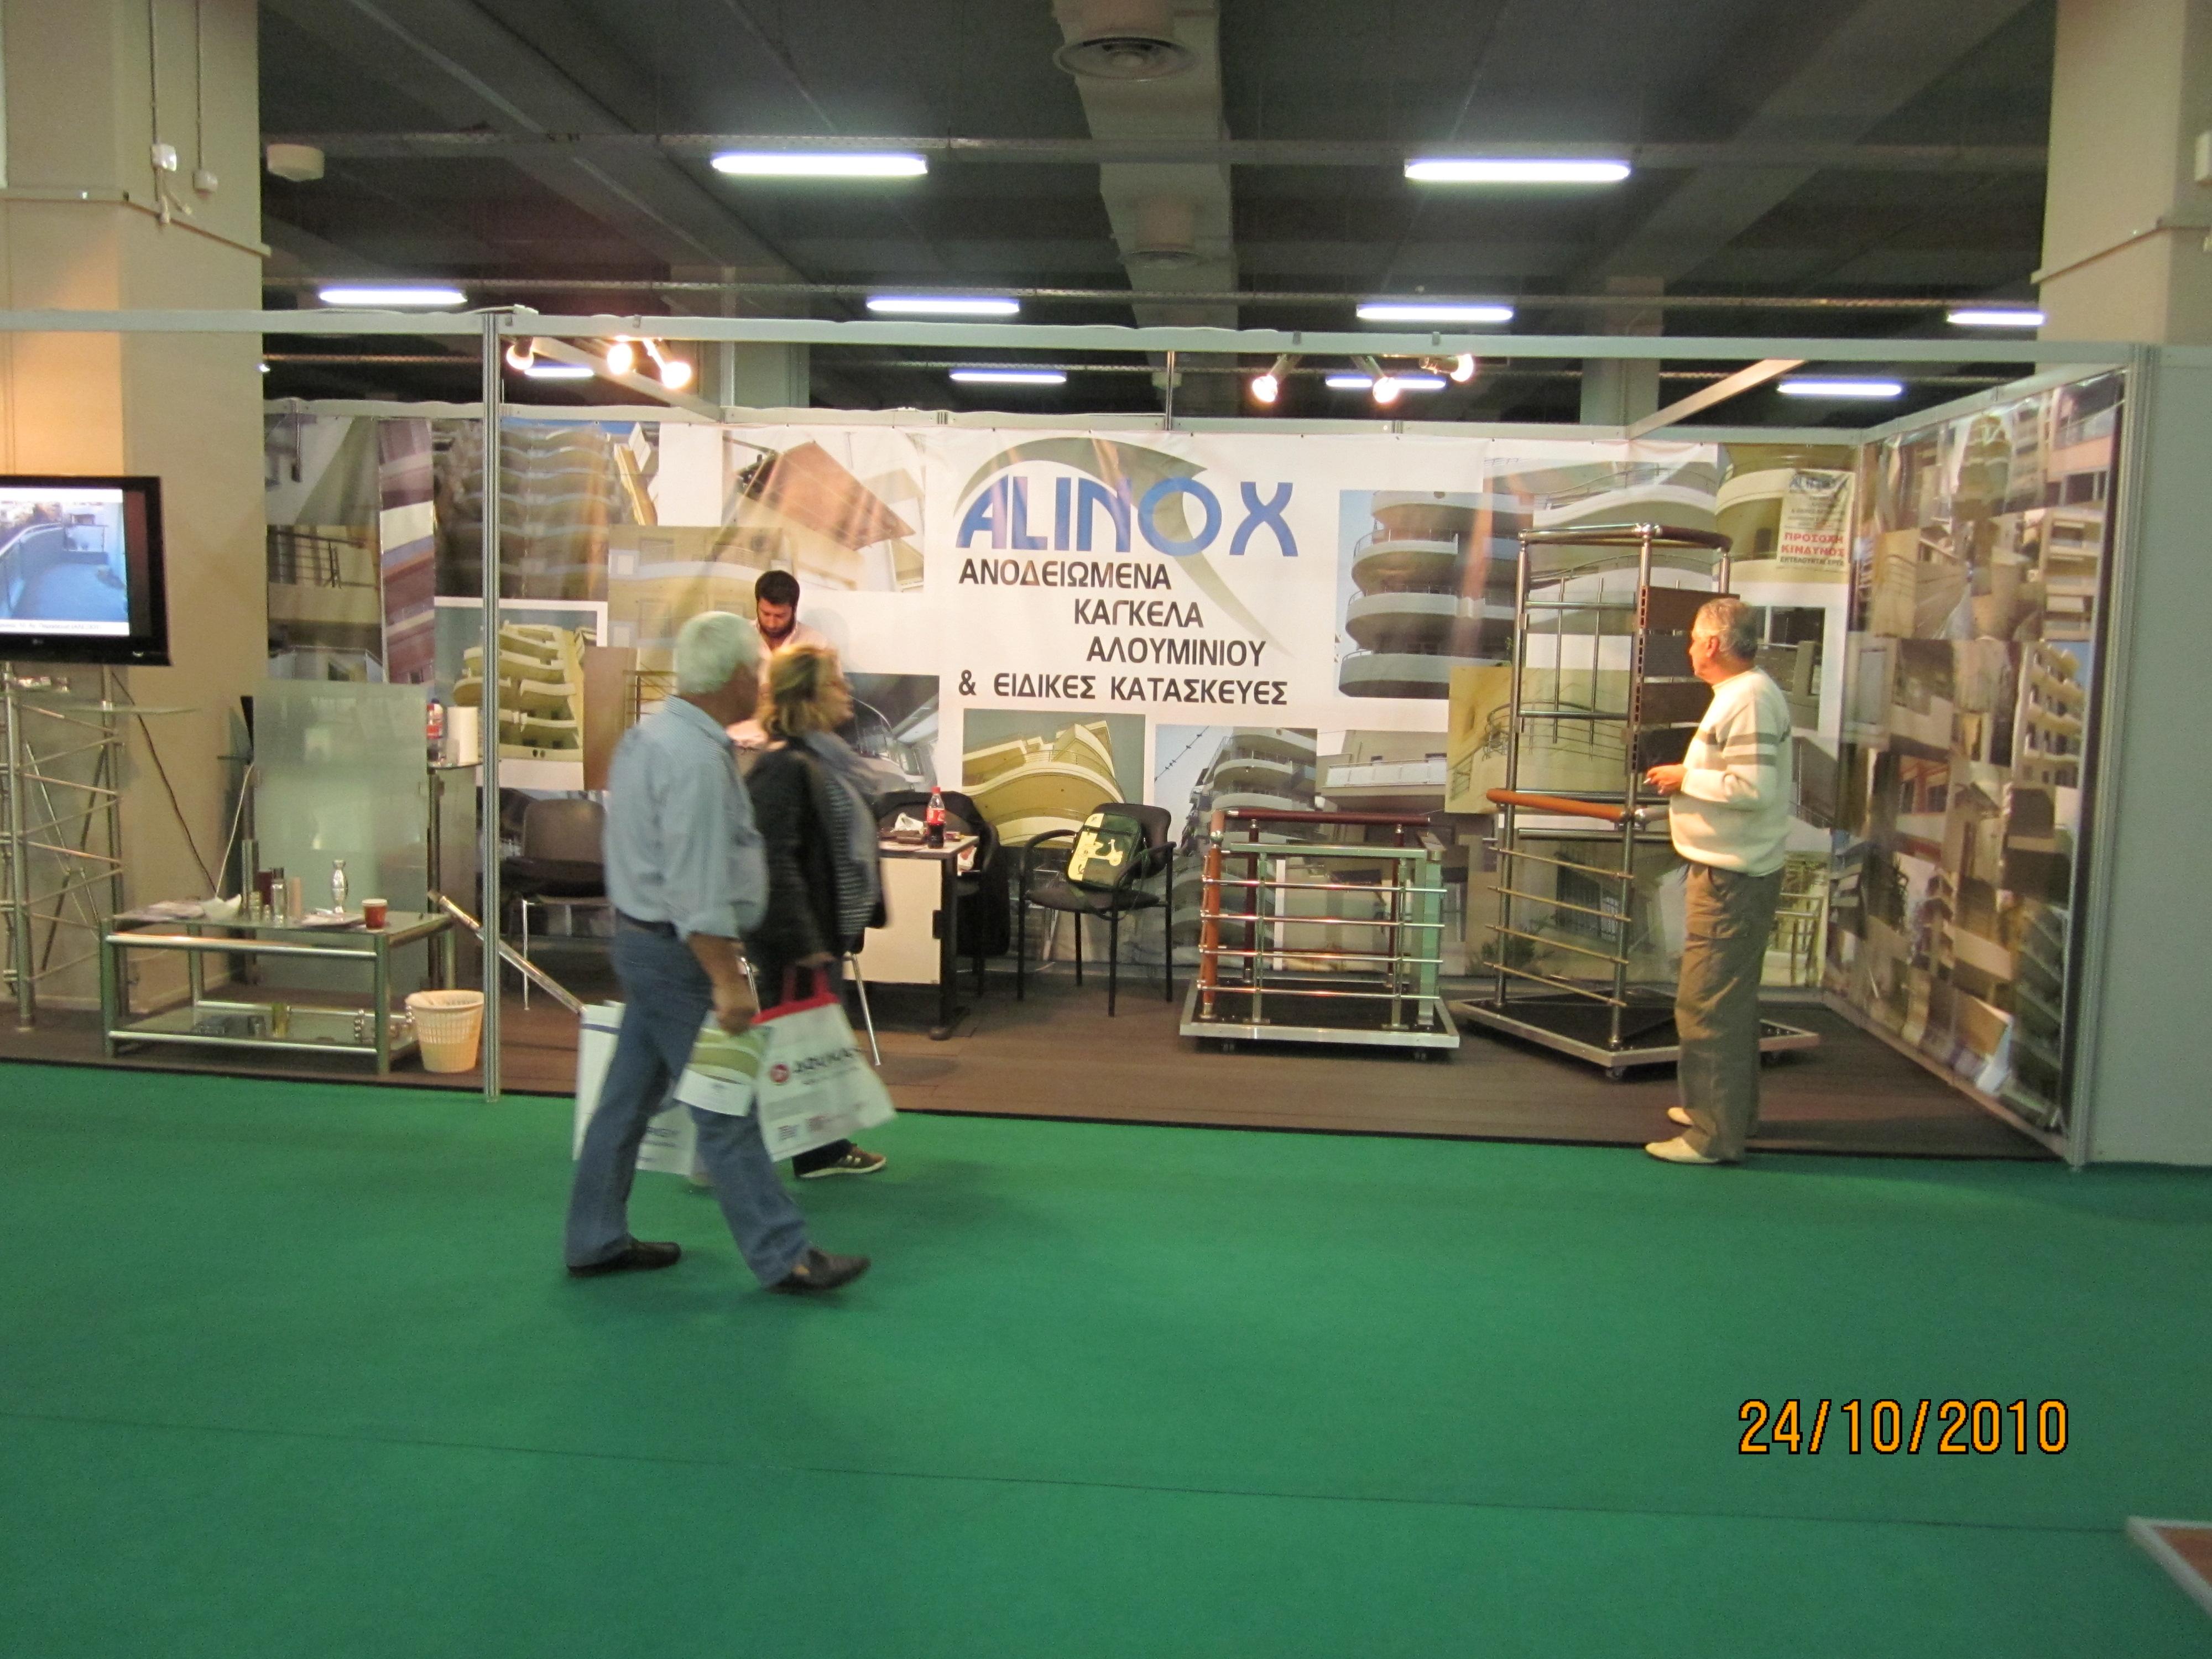 Expo_Athens_14.JPG